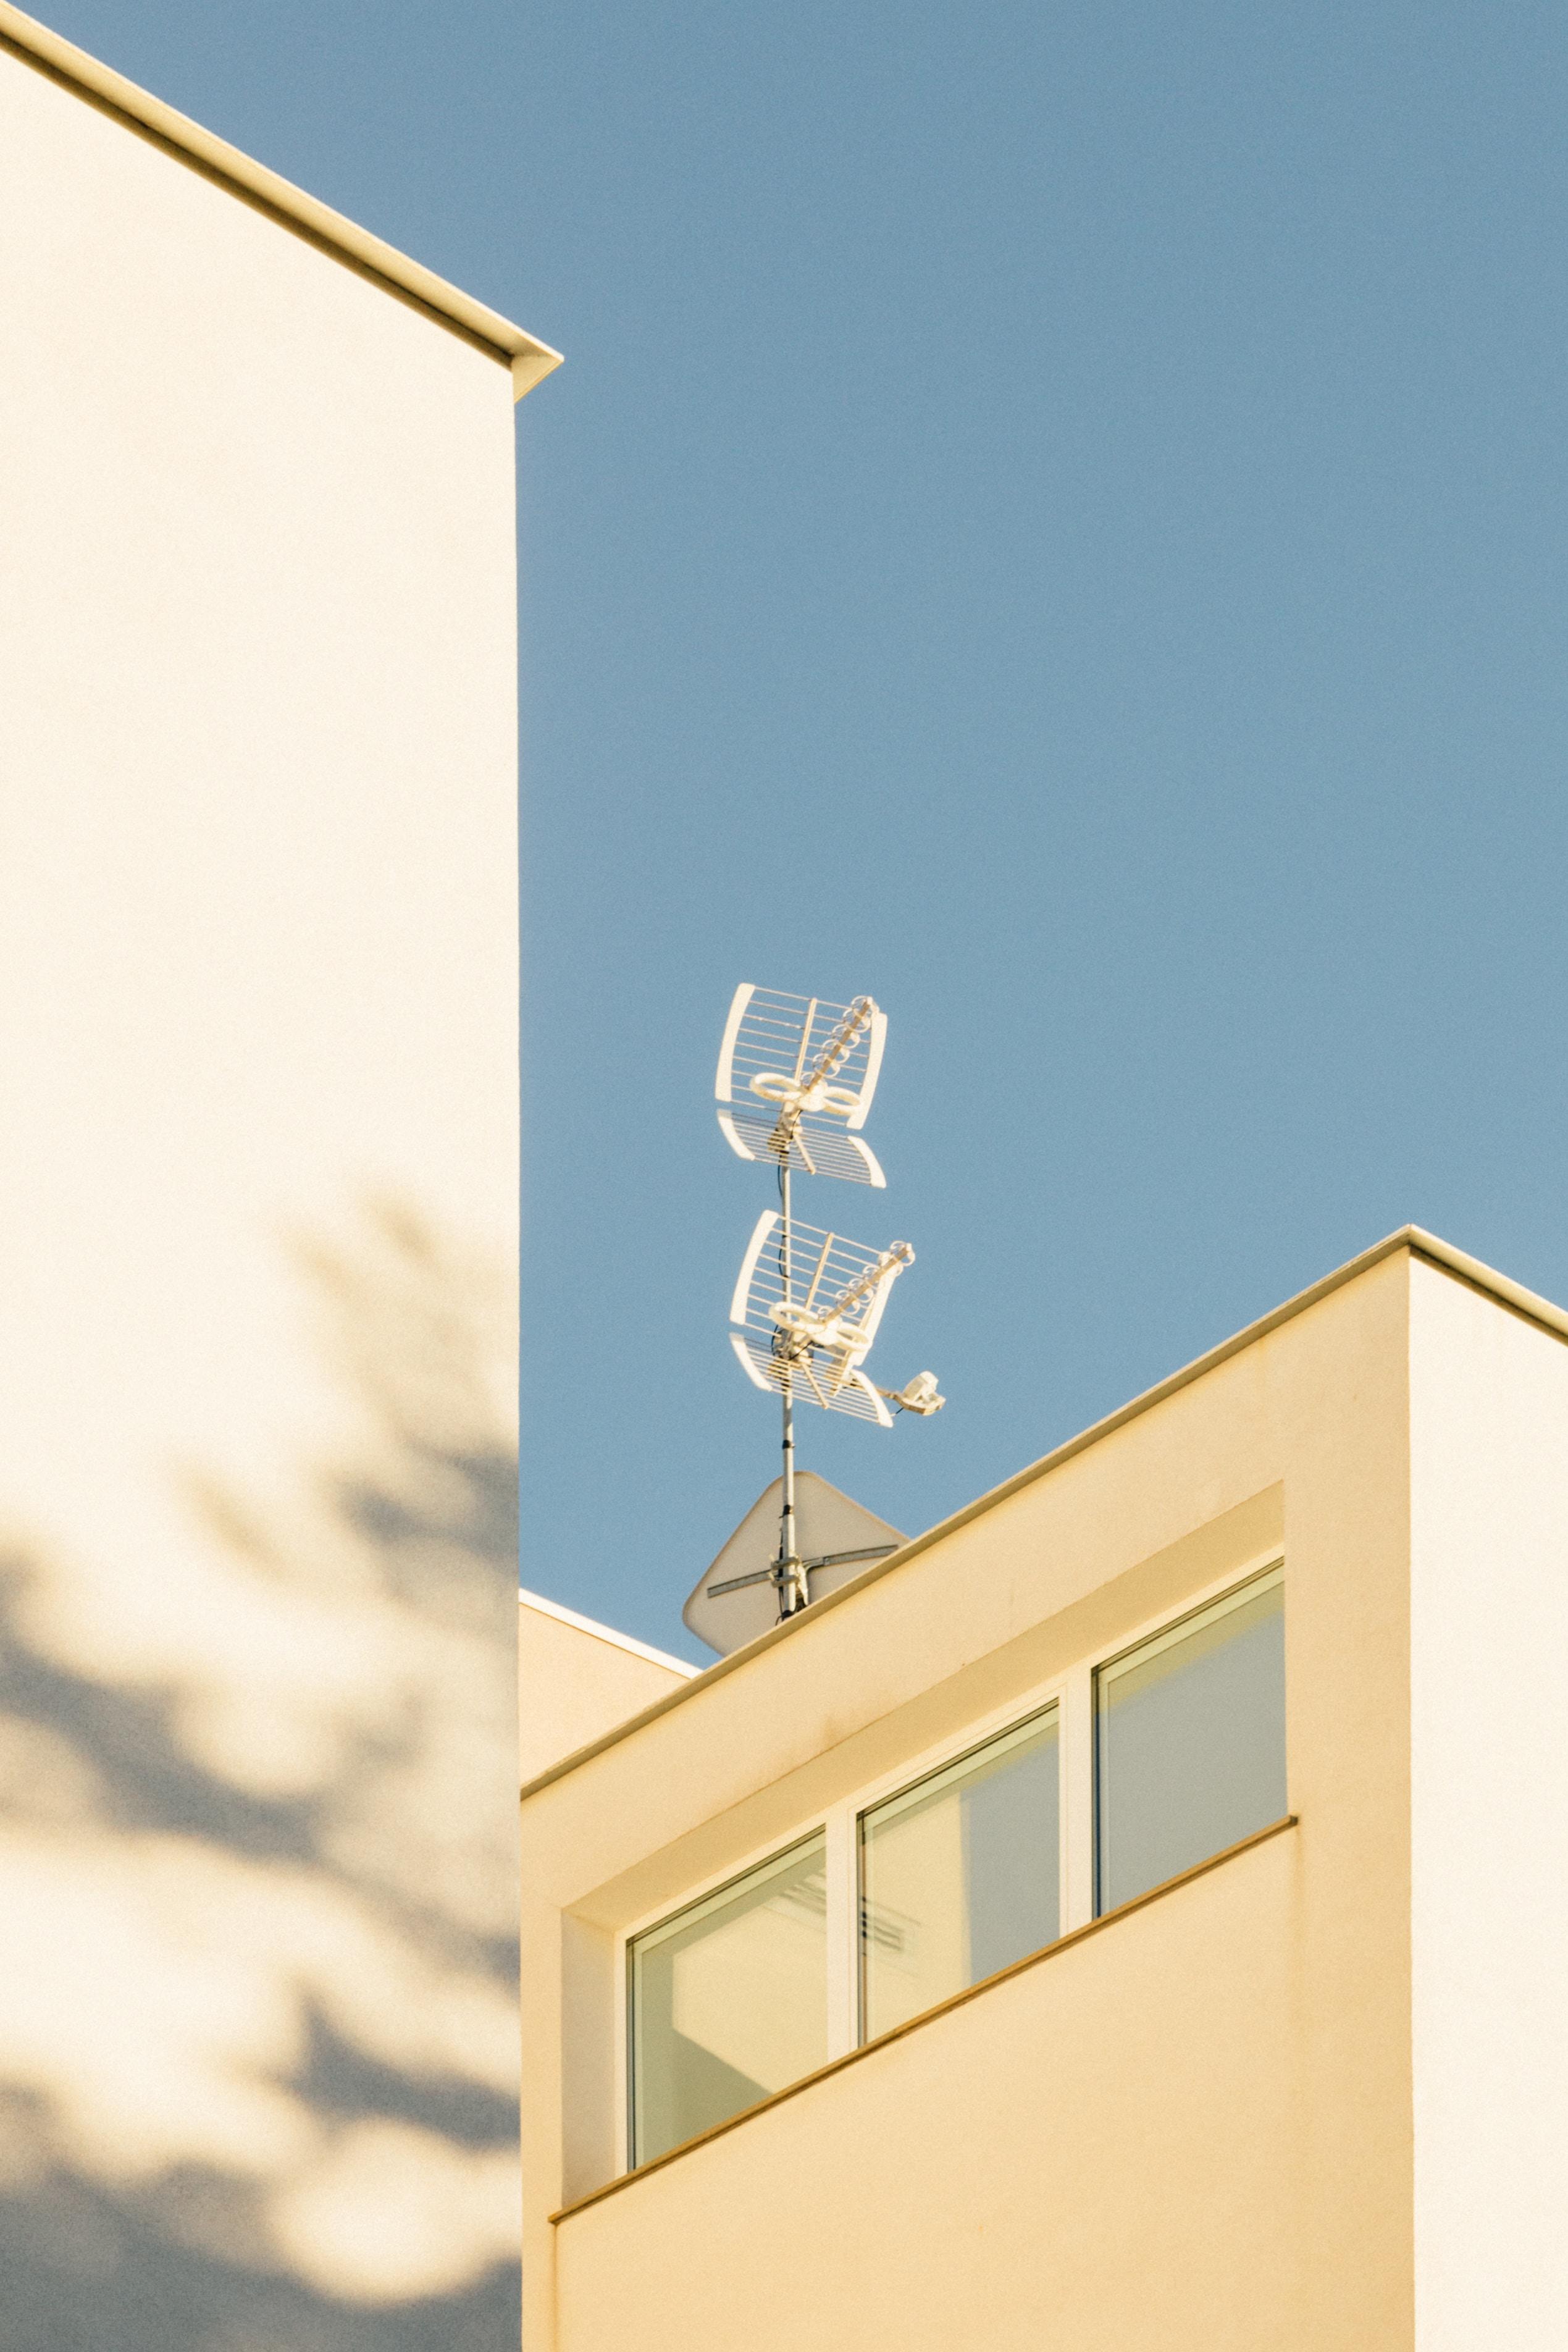 white antenna on building